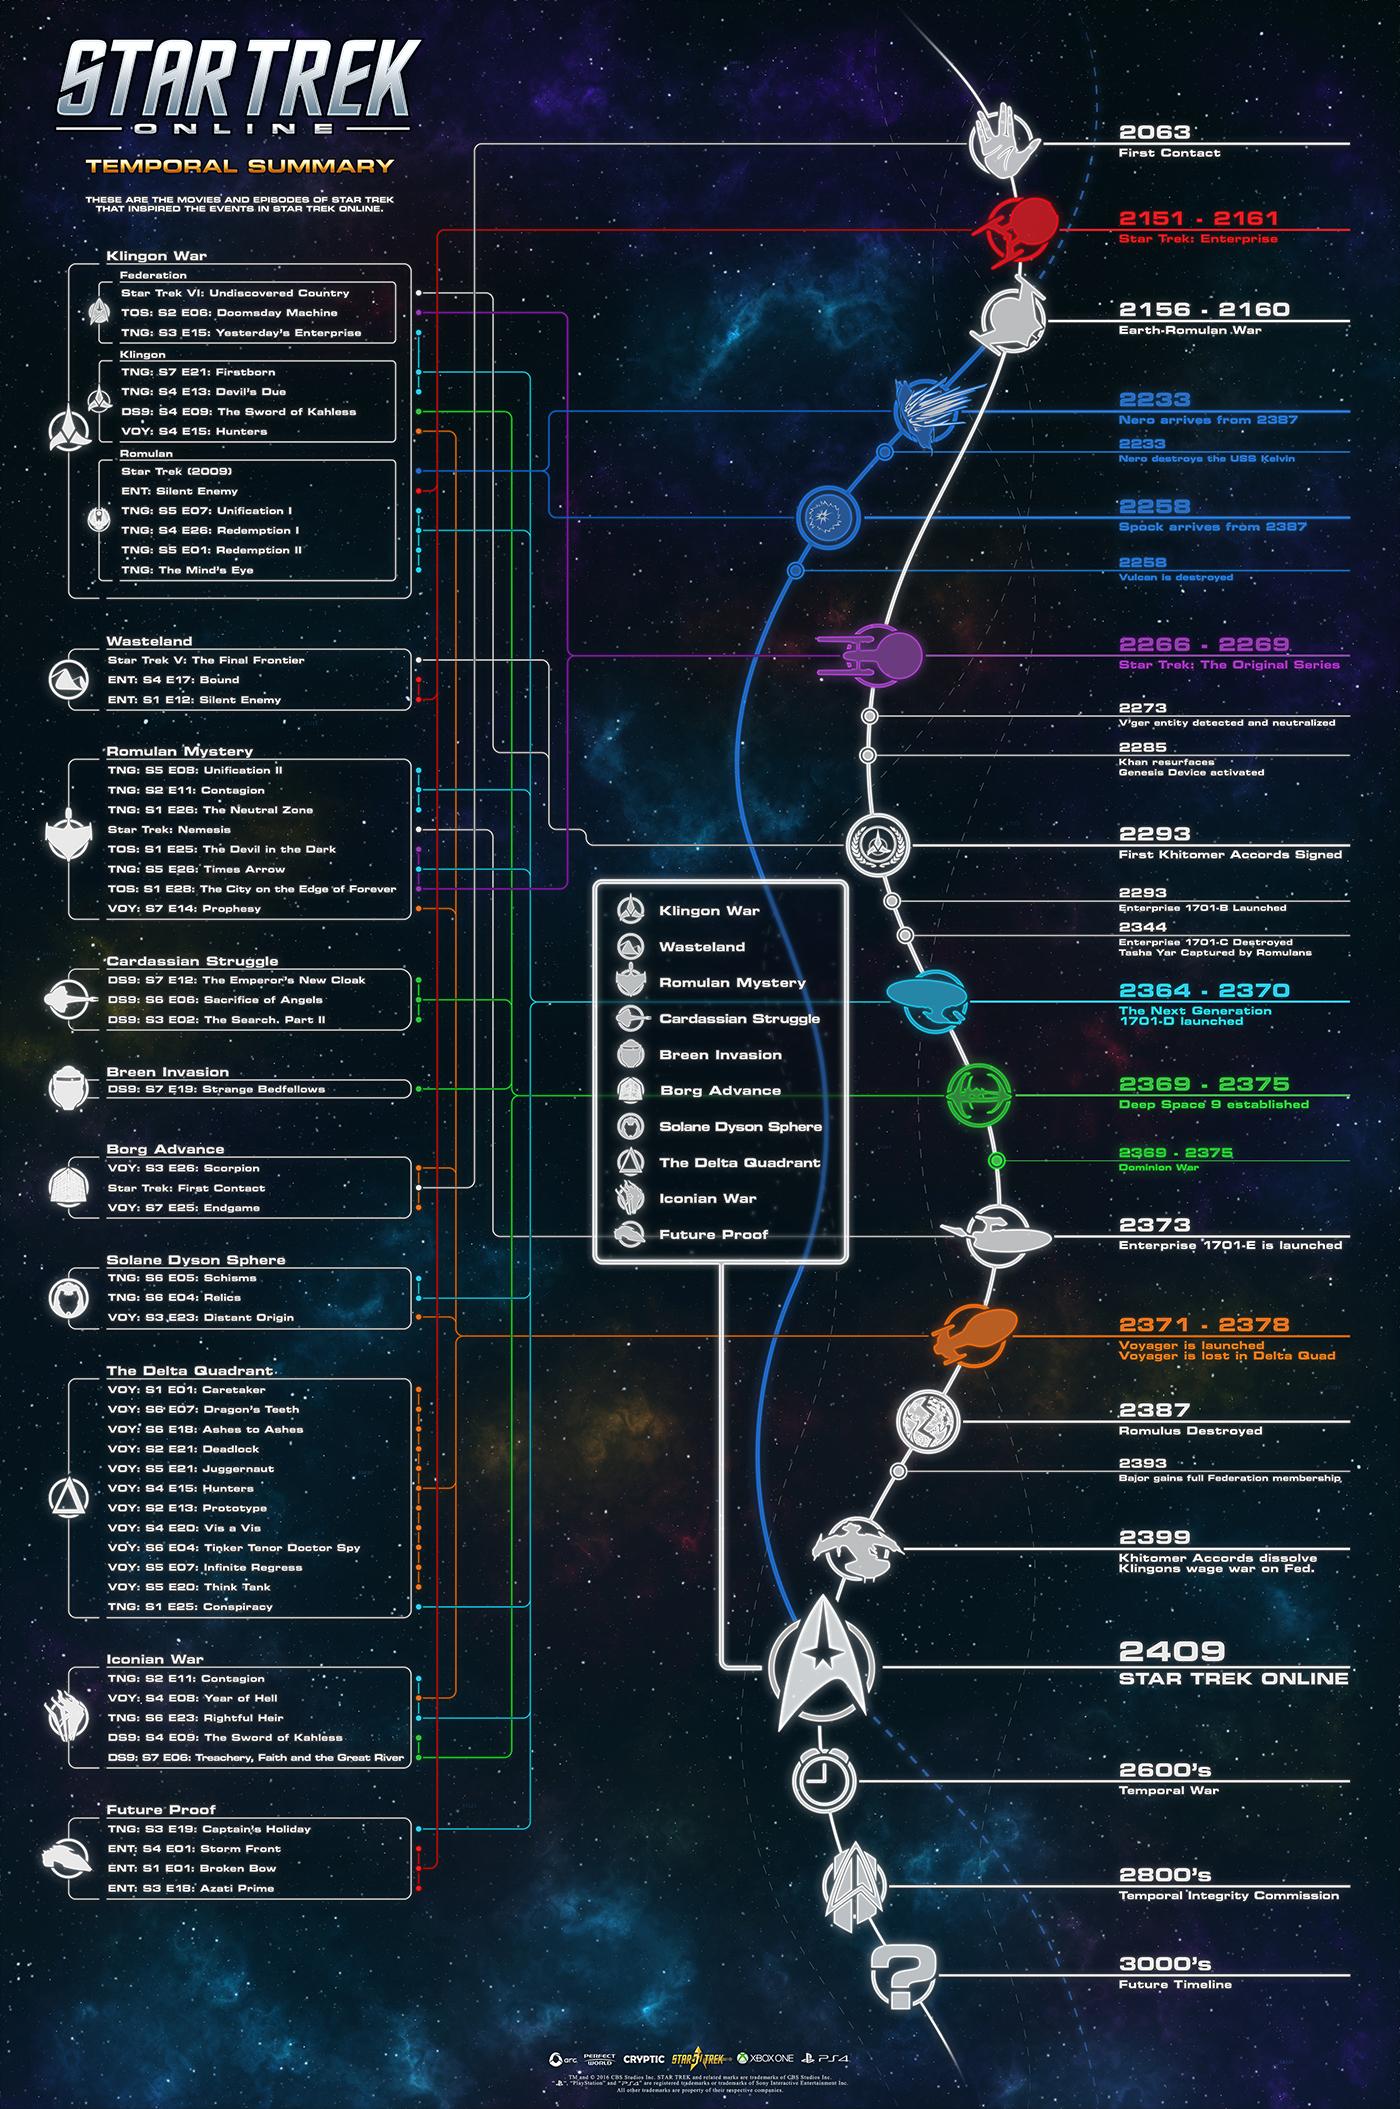 STAR TREK ONLINE | Star Trek - Temporal Summary timeline